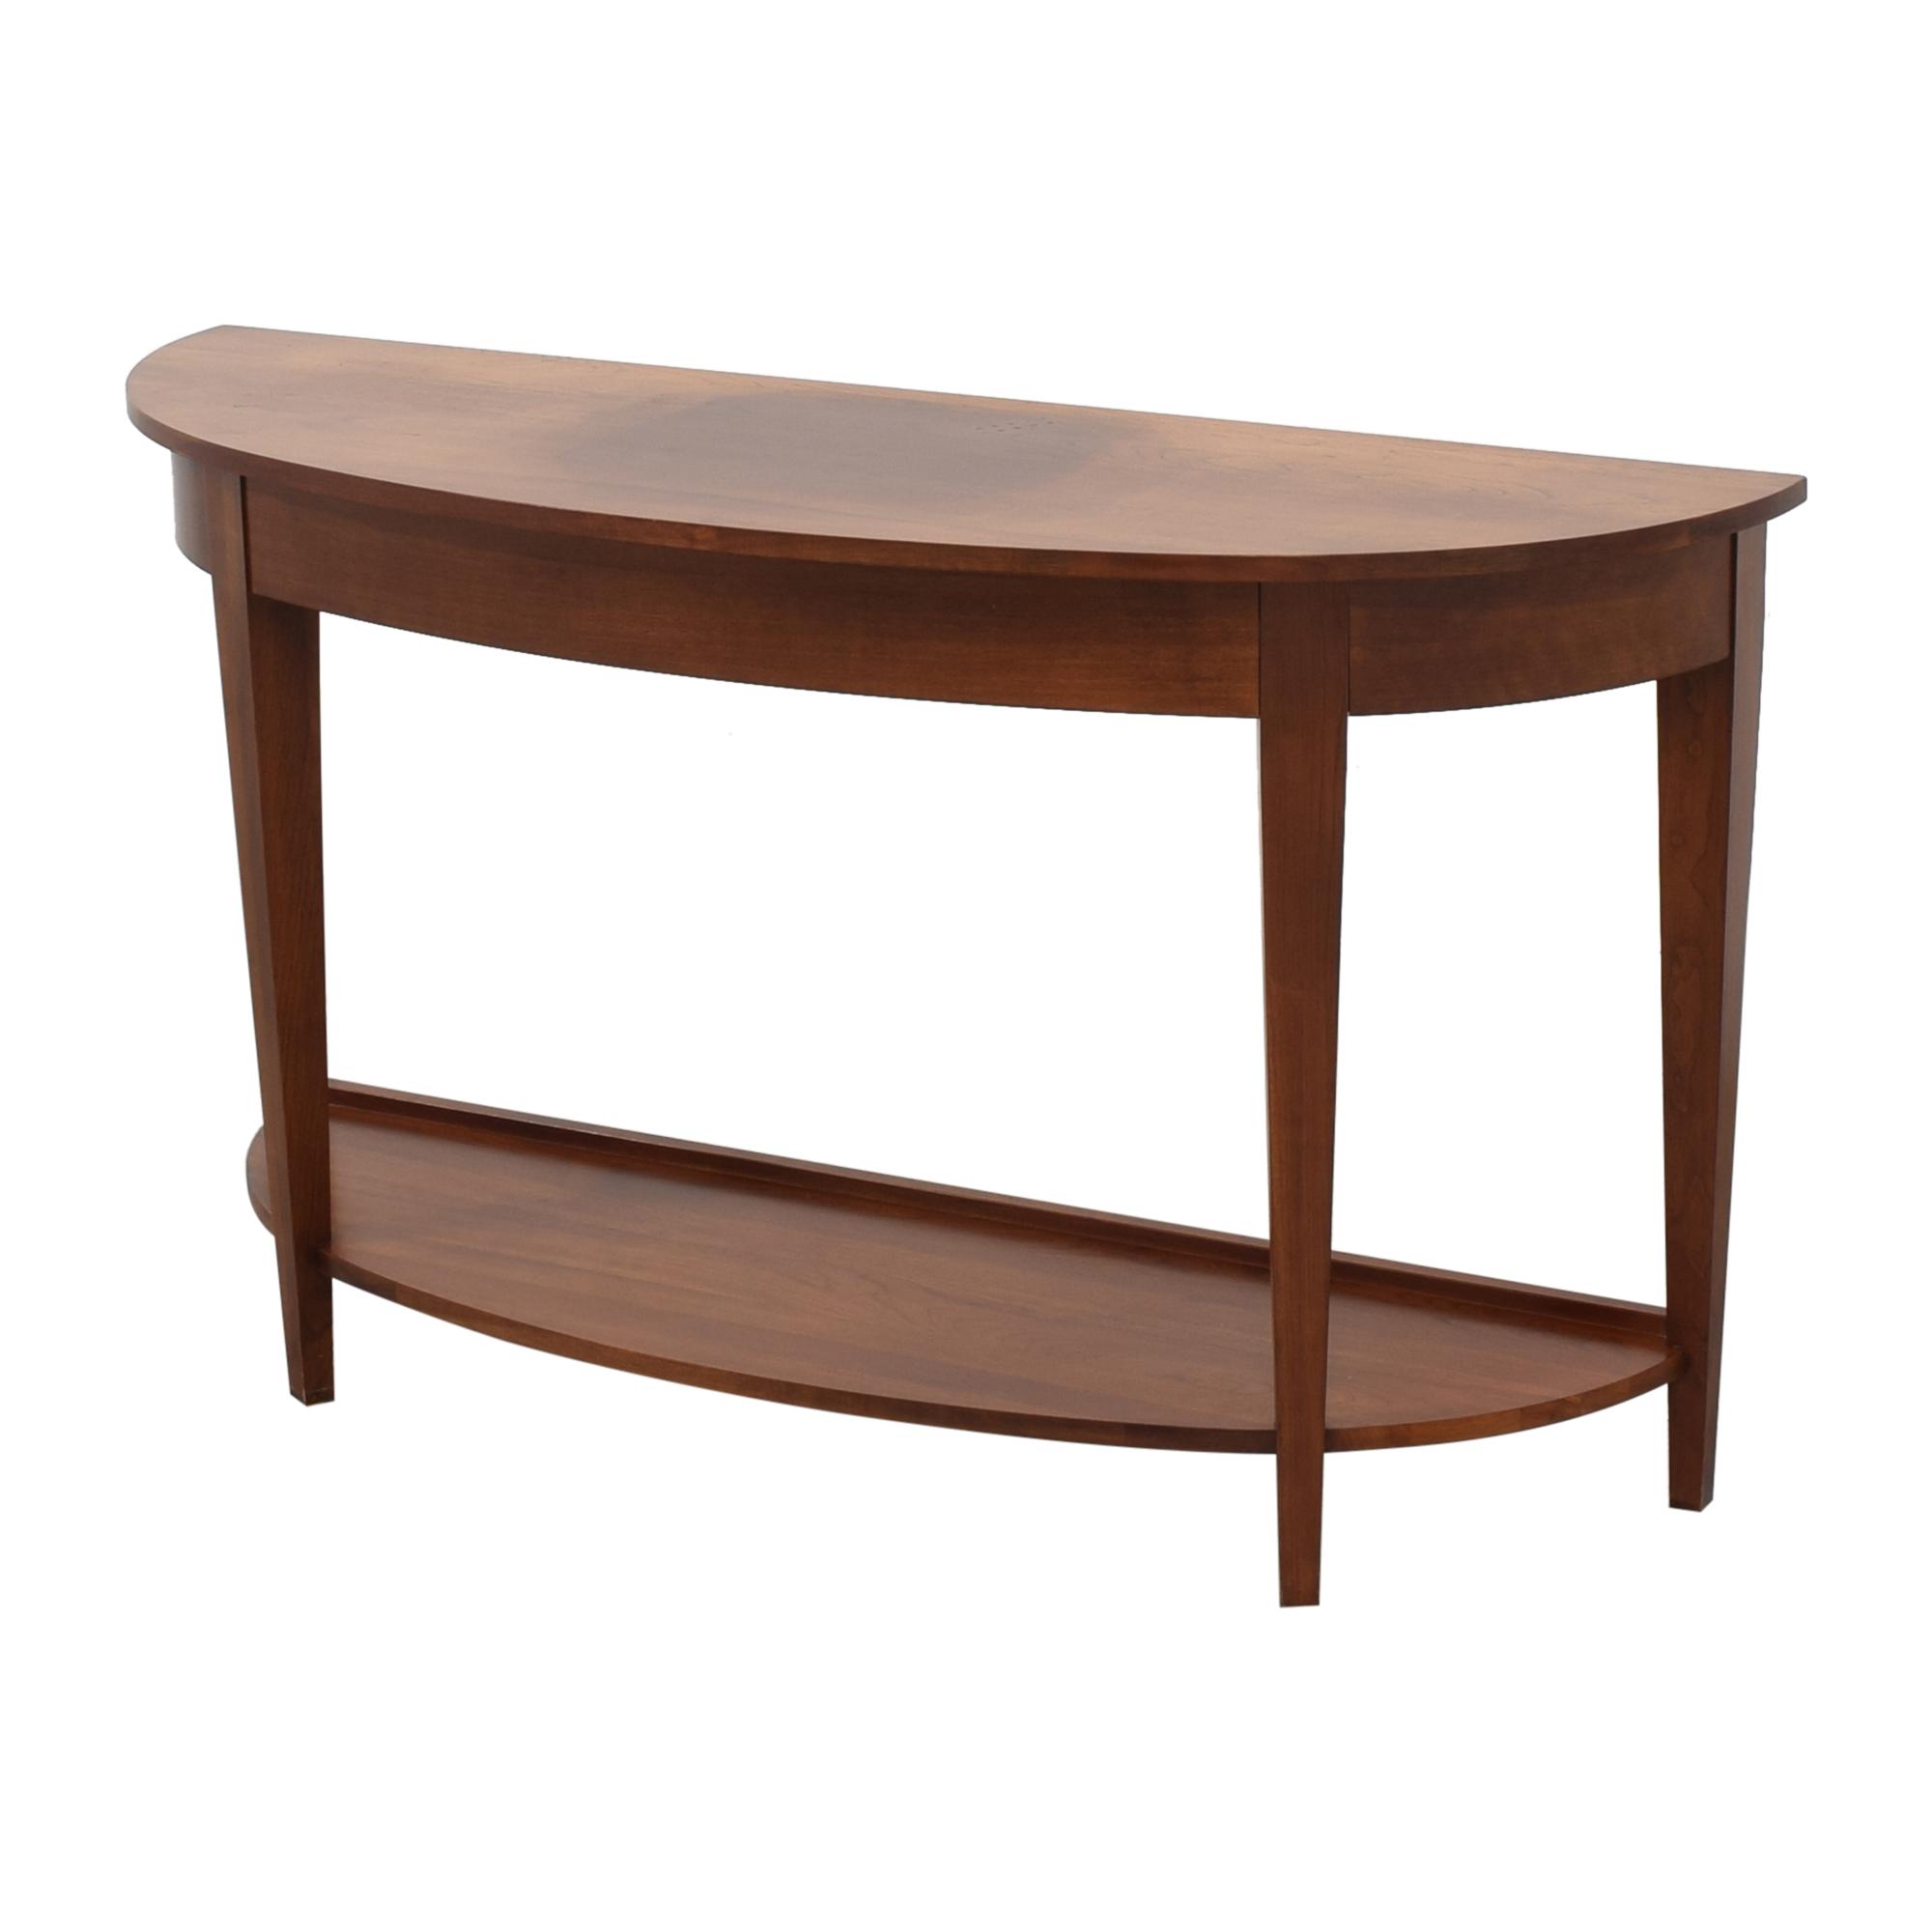 Ethan Allen Ethan Allen American Impressions Demilune Sofa Table nj